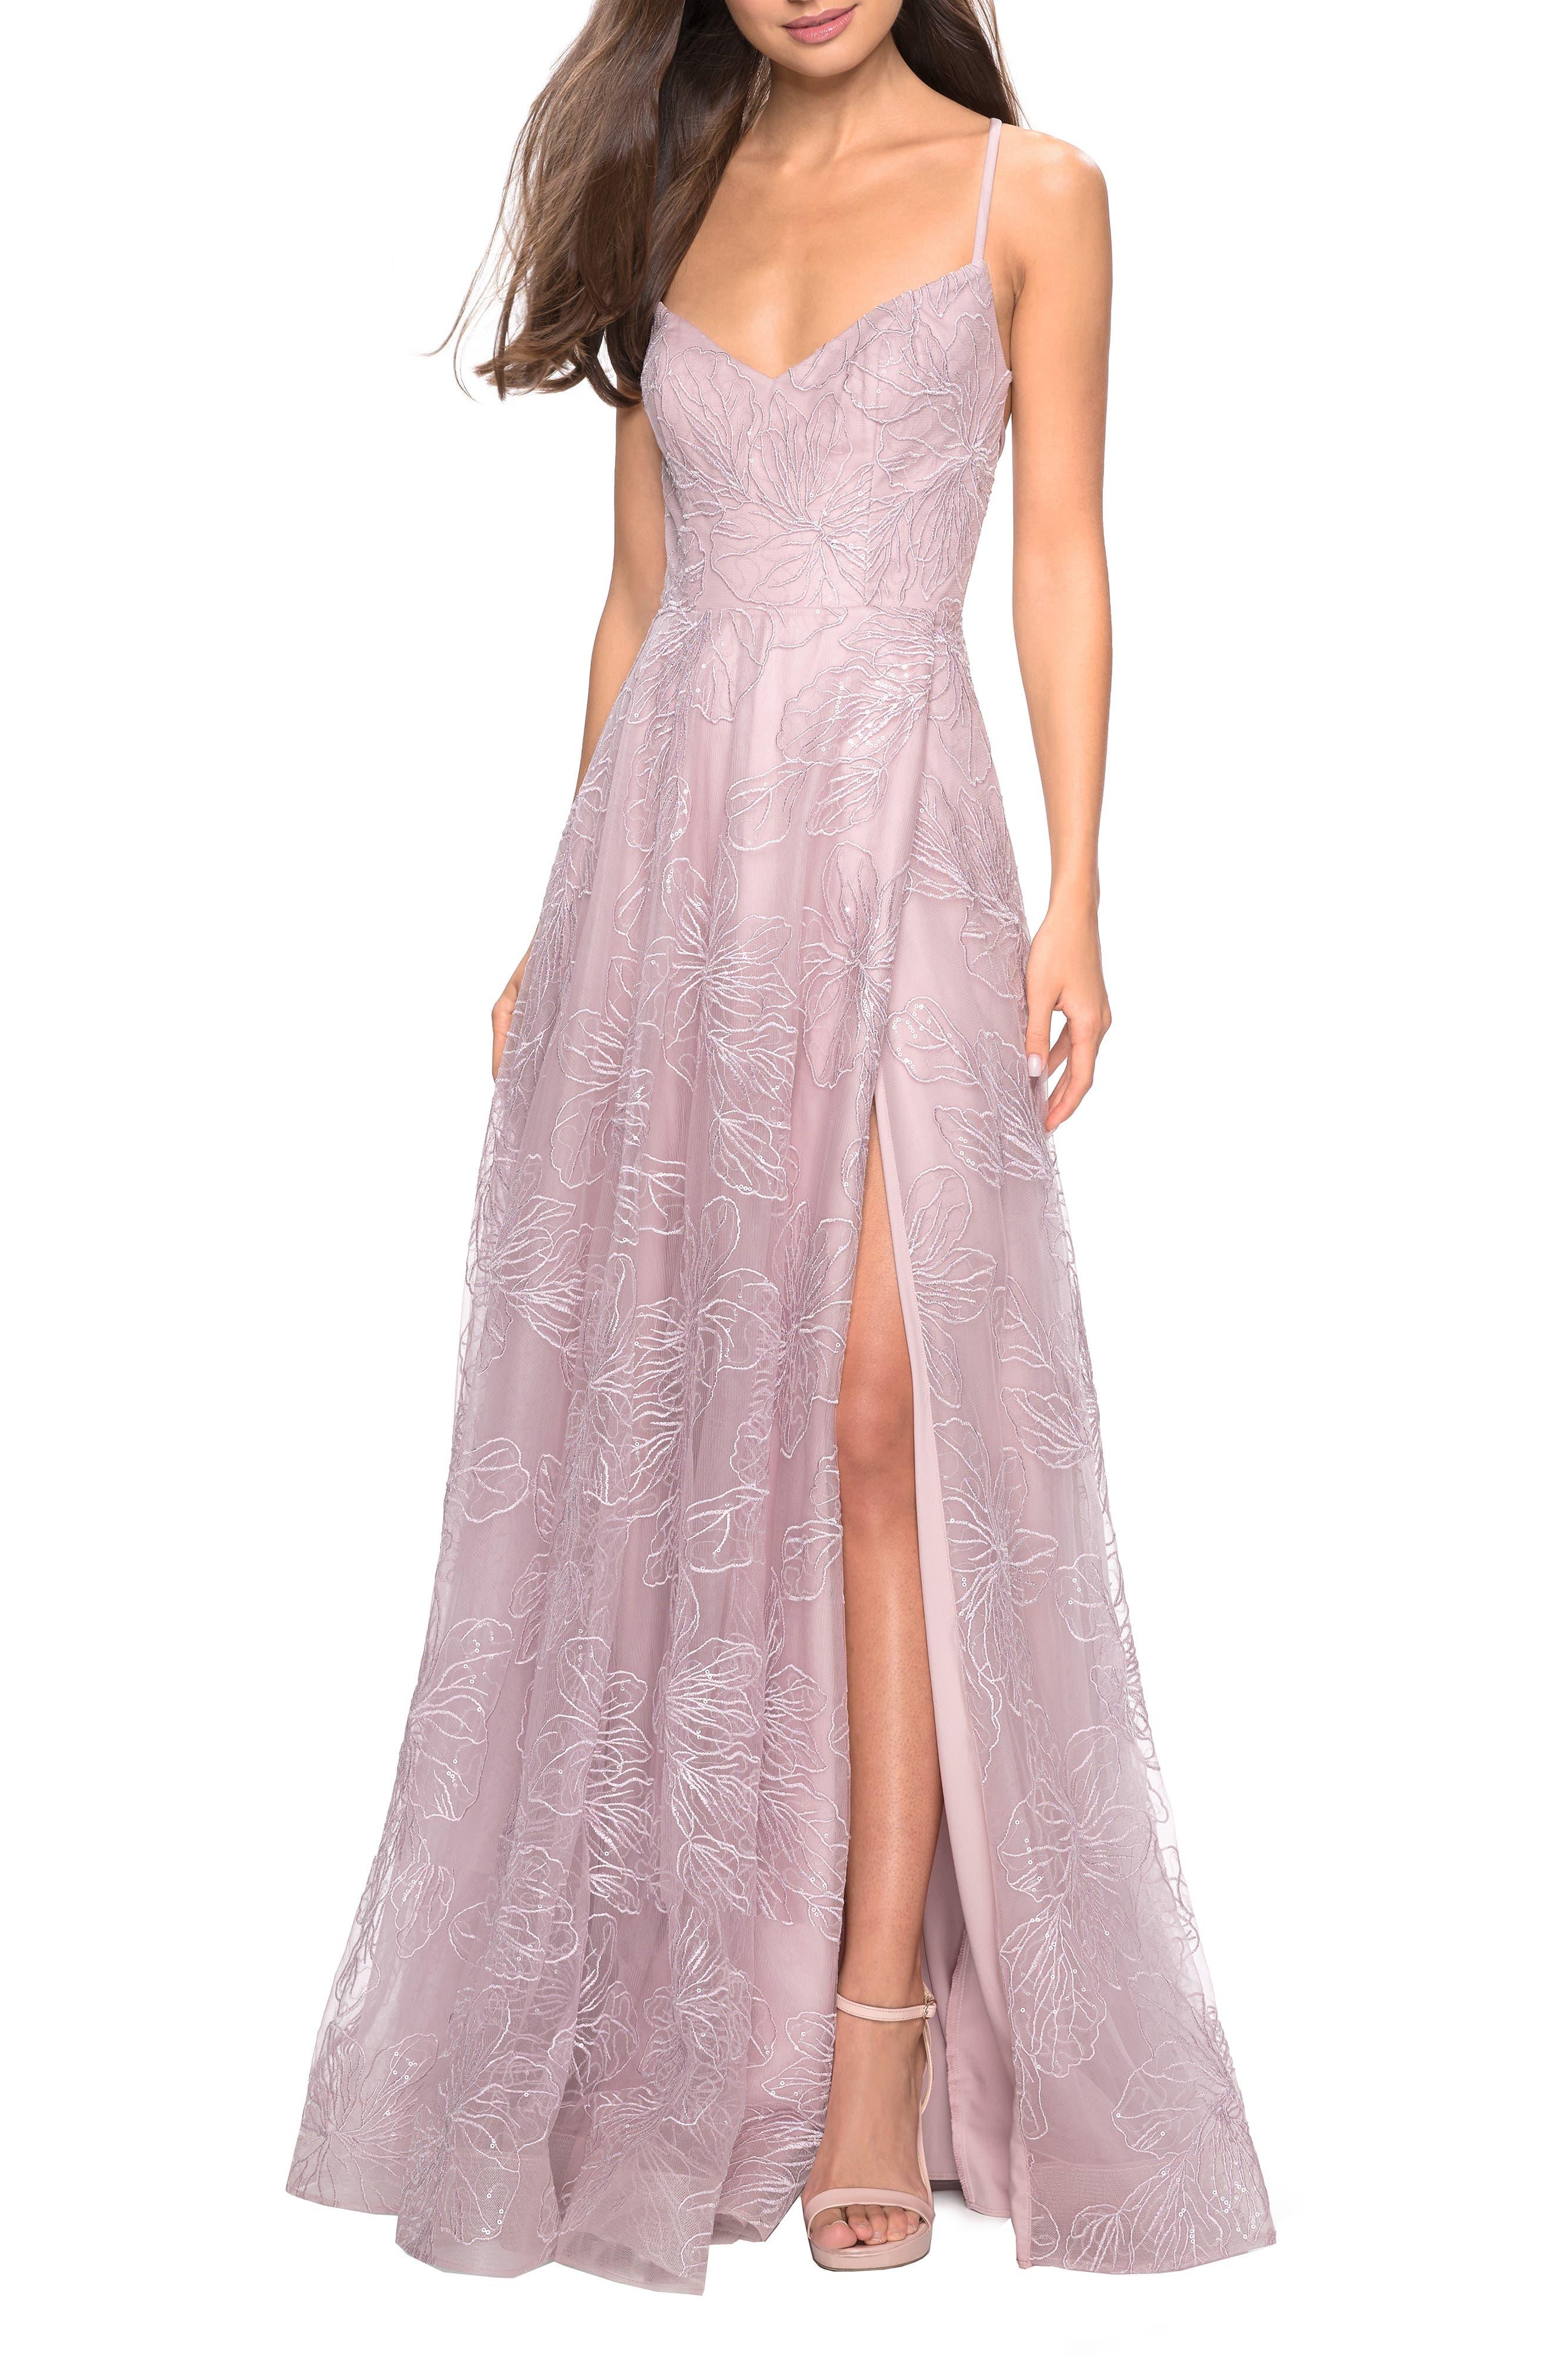 LA FEMME, Metallic Floral Embellished Evening Dress, Alternate thumbnail 6, color, MAUVE